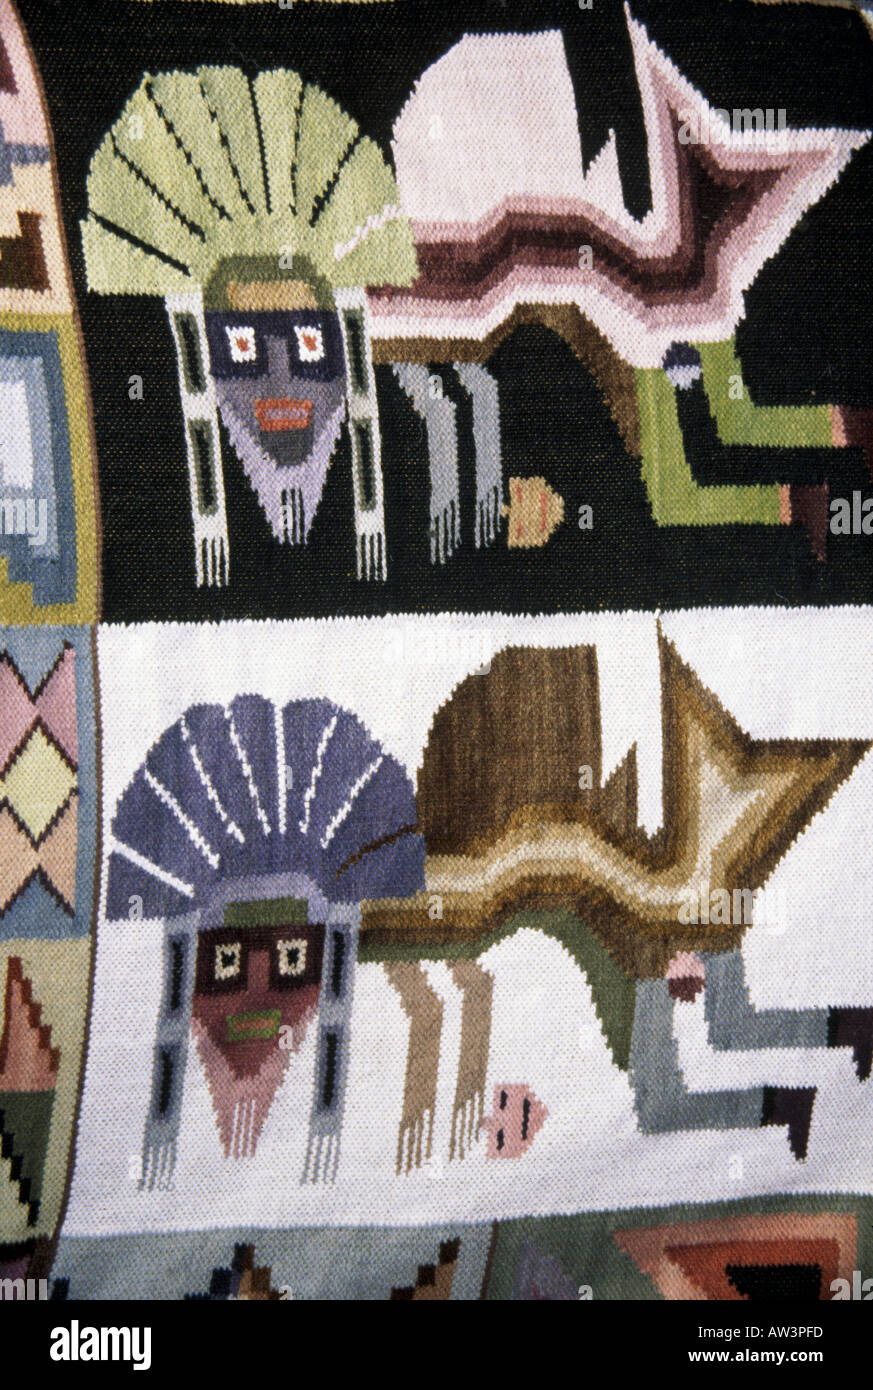 PERU - textile designs - Stock Image